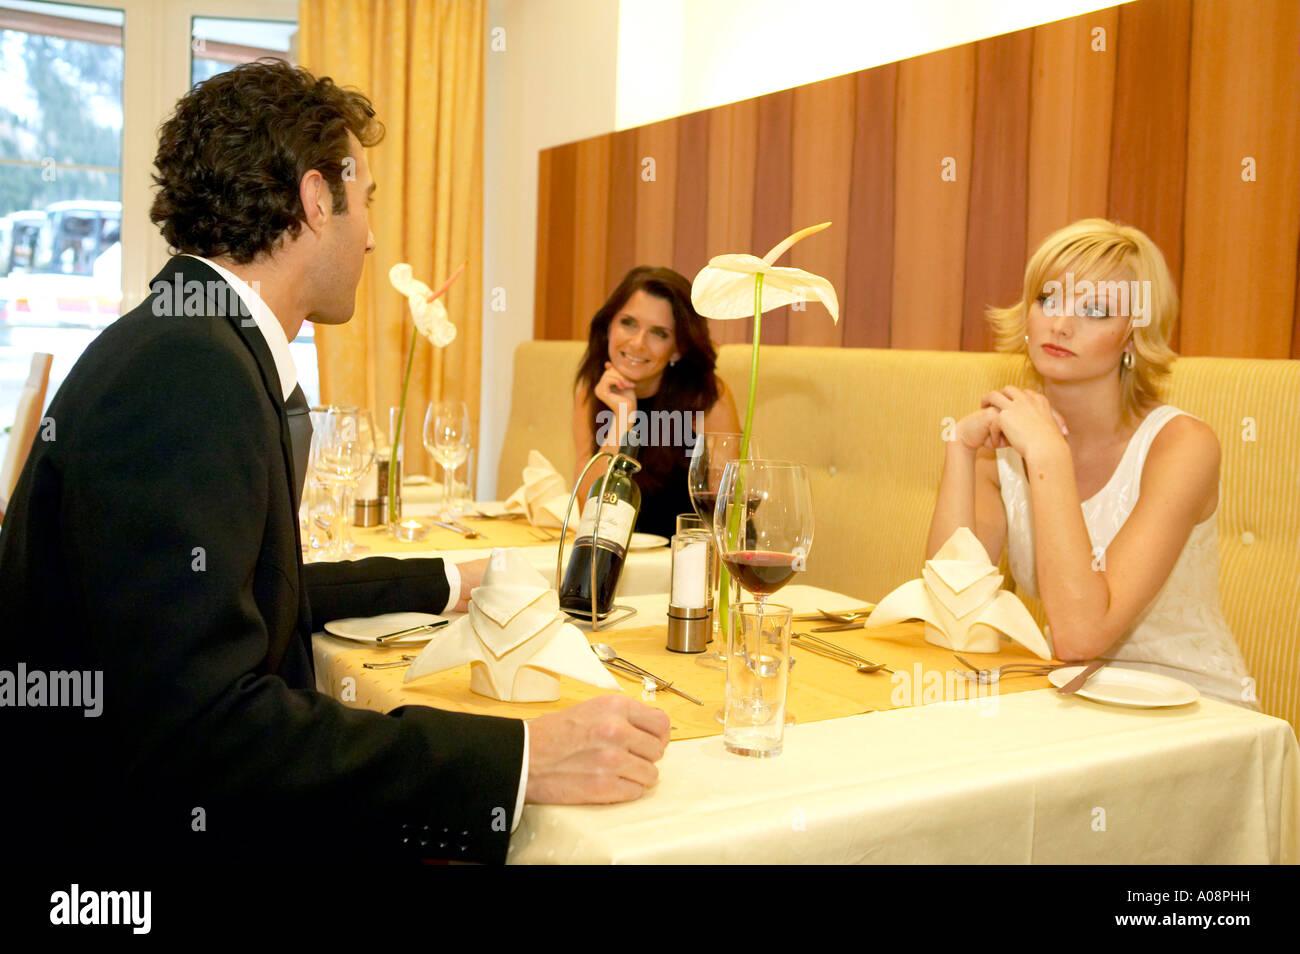 Paar im Restaurant Eifersucht, couple in restaurant jealousy - Stock Image